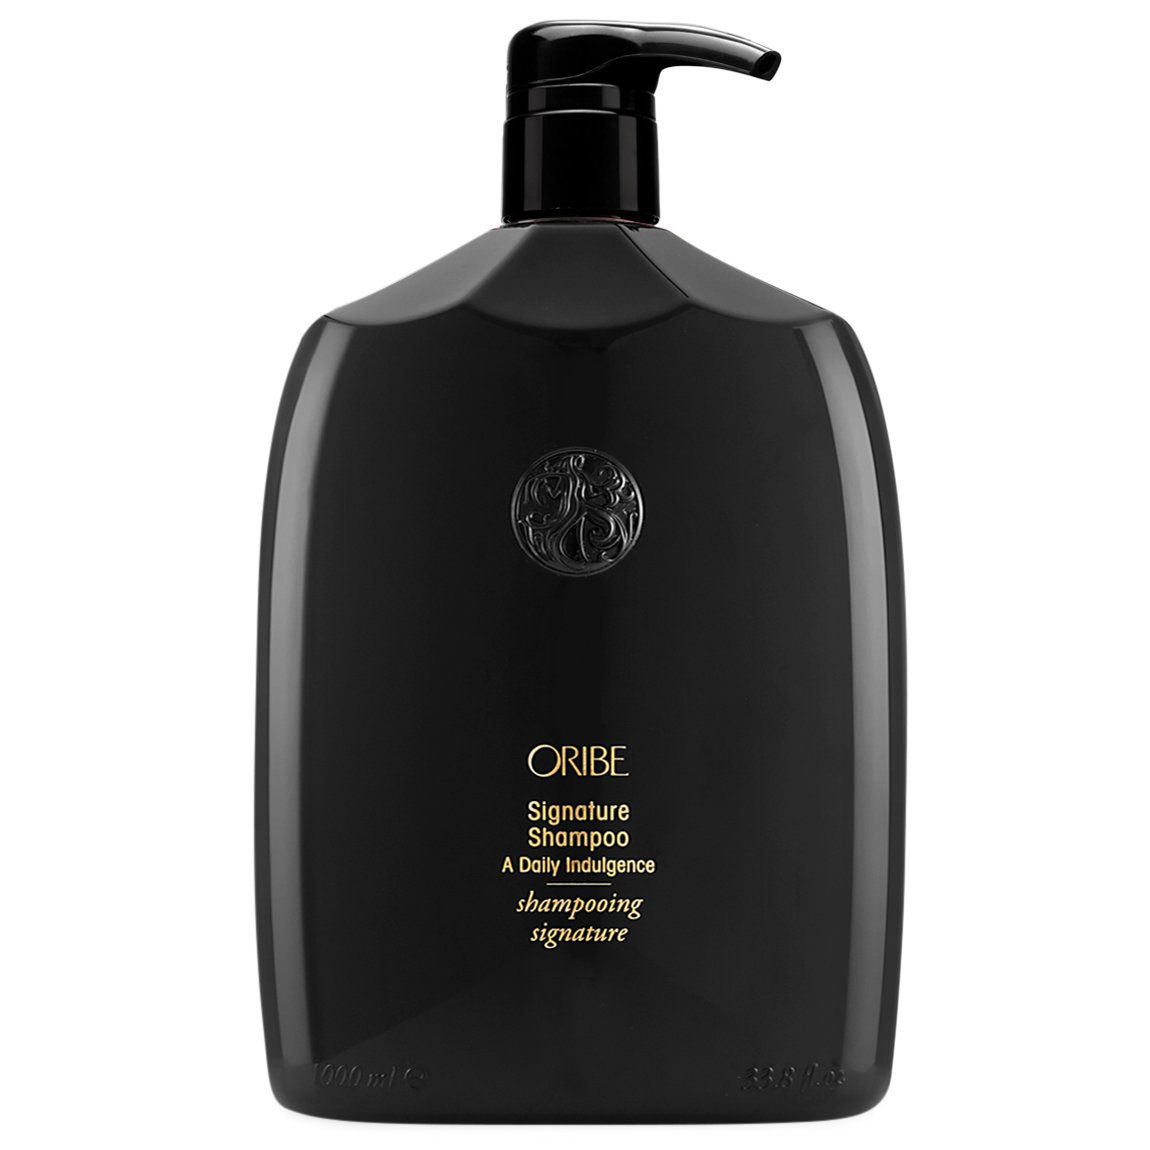 Oribe Signature Shampoo 1 L alternative view 1 - product swatch.